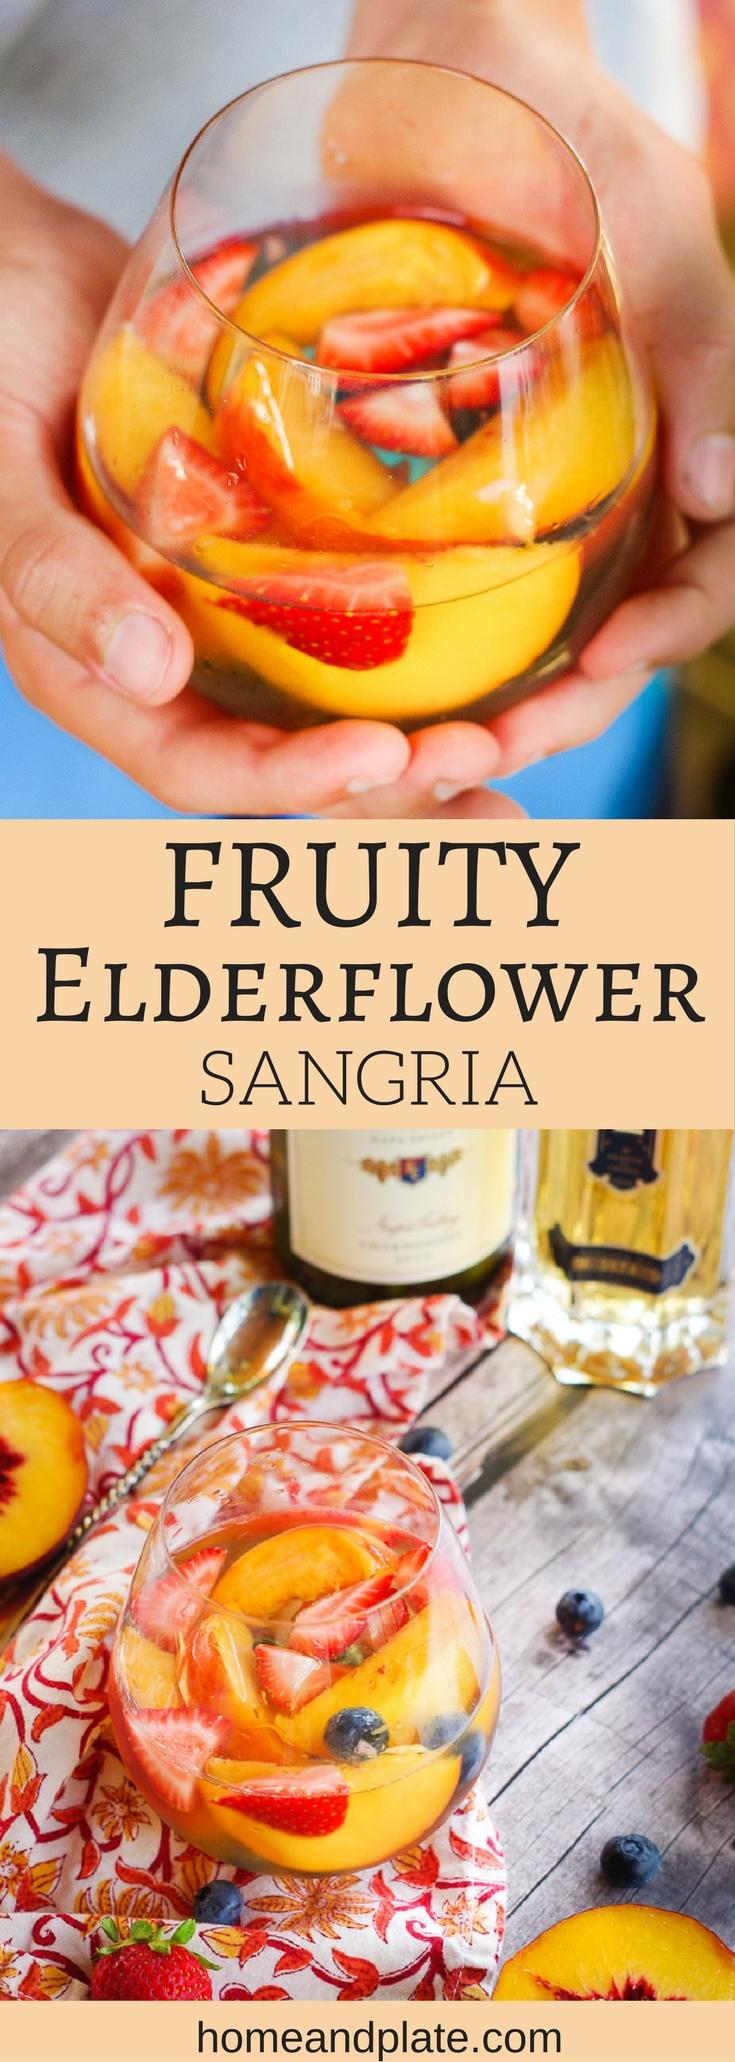 Fruity Elderflower Sangria | Summer's freshest fruits and elderflower liqueur are the stars of this fruity summer sangria spritzer. | www.homeandplate.com